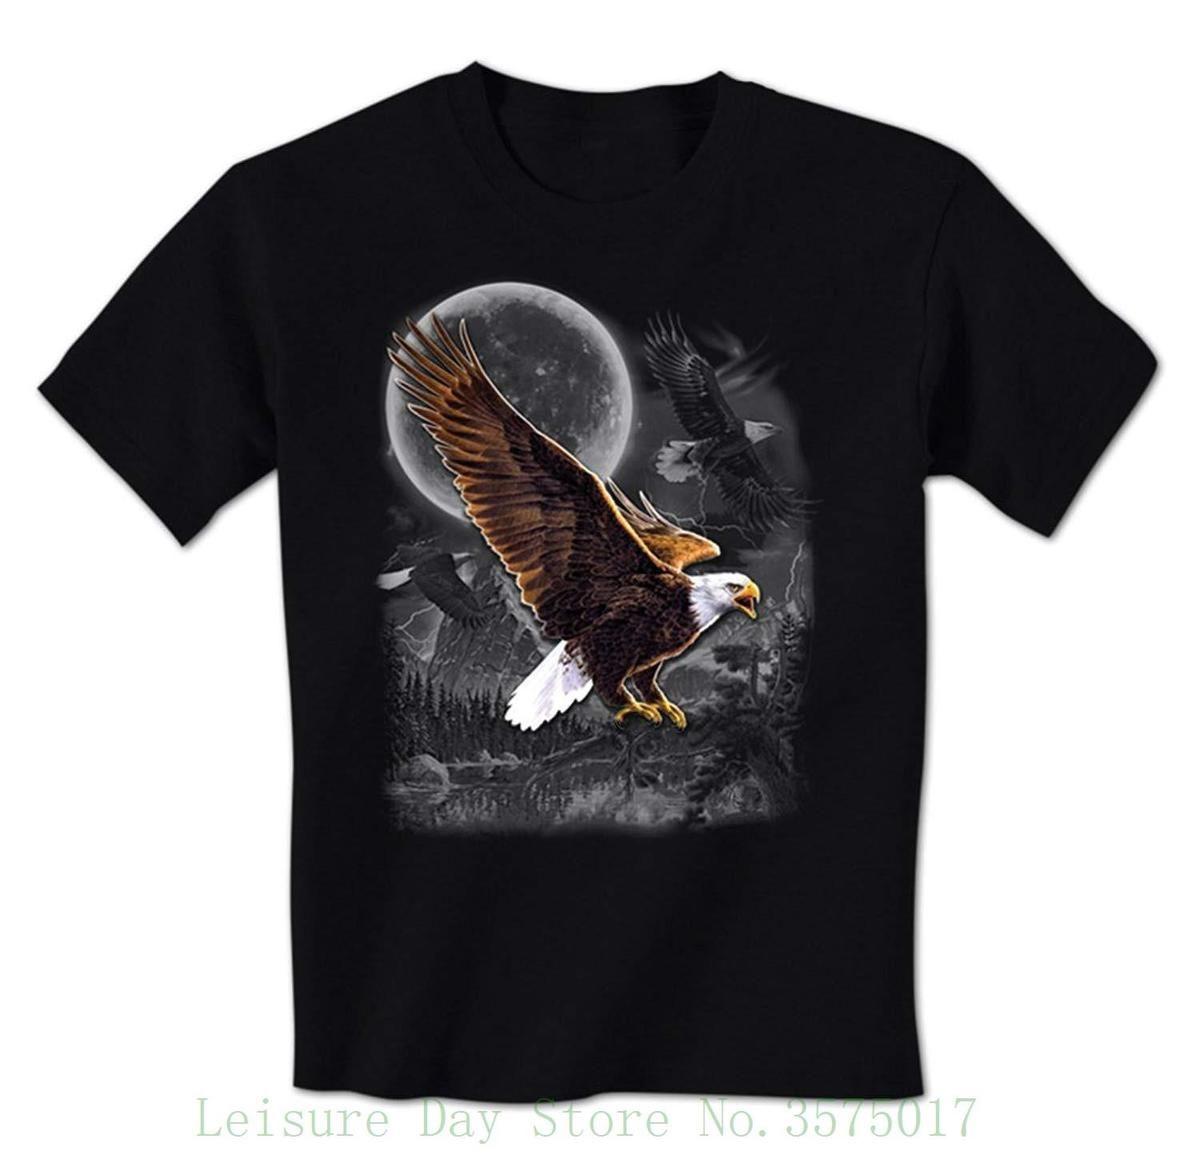 Ertong Buffalo Plaid Moose Boys Girls Kids Classic 2-6T Short Sleeve Crewneck Tshirt Top